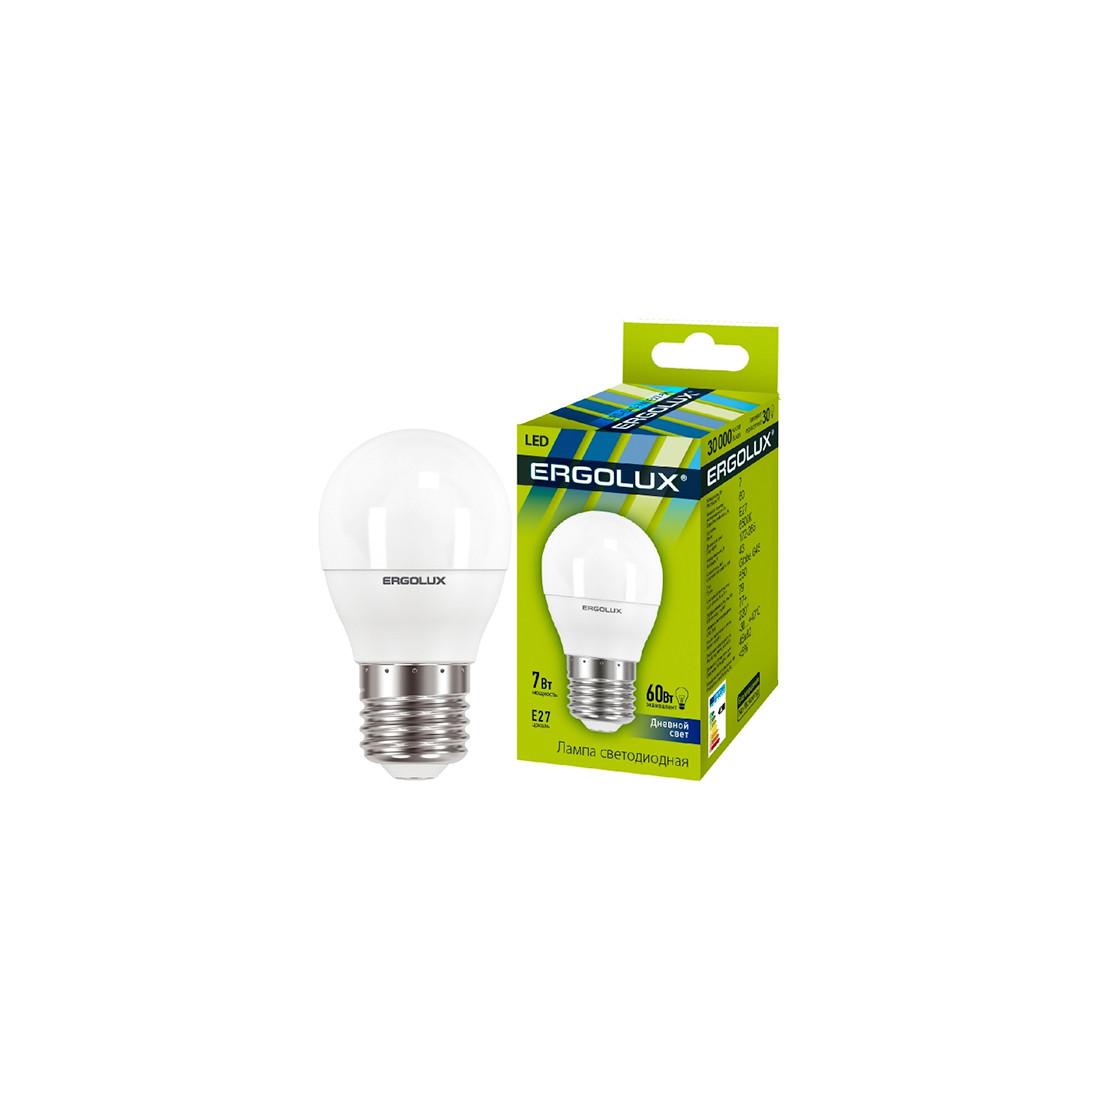 Эл. лампа светодиодная Ergolux LED-G45-7W-E27-6K Шар Дневной